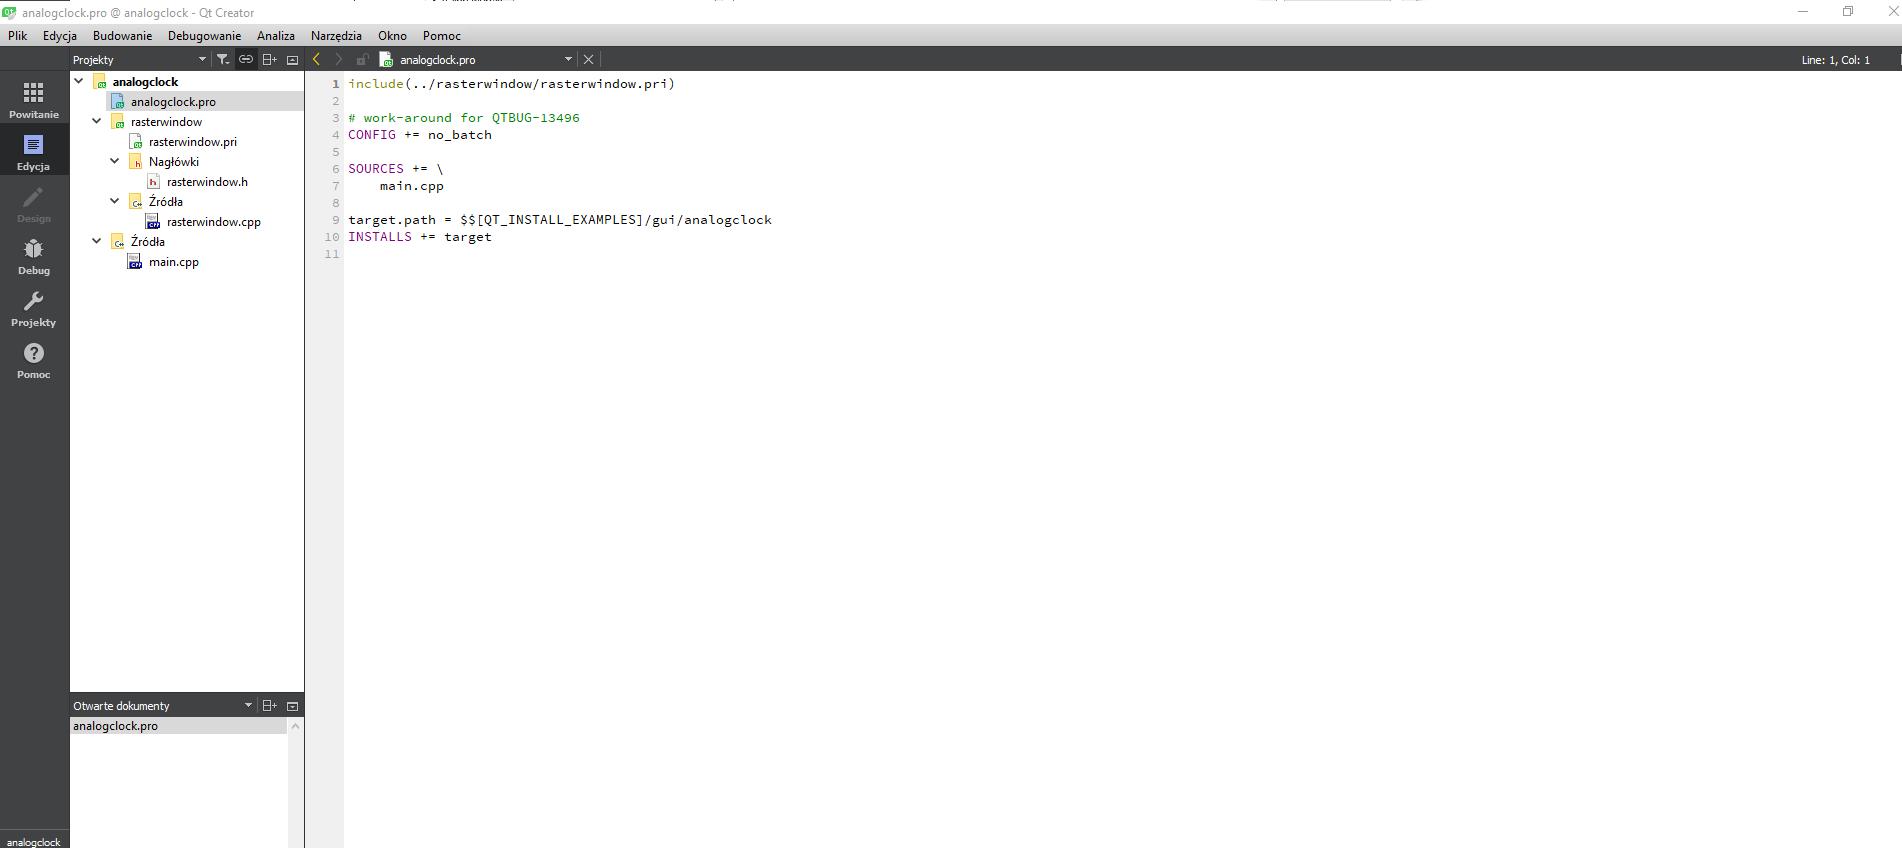 0_1550740821226_d2ae4a33-8bff-4344-bdc3-e2f5c6865588-obraz.png